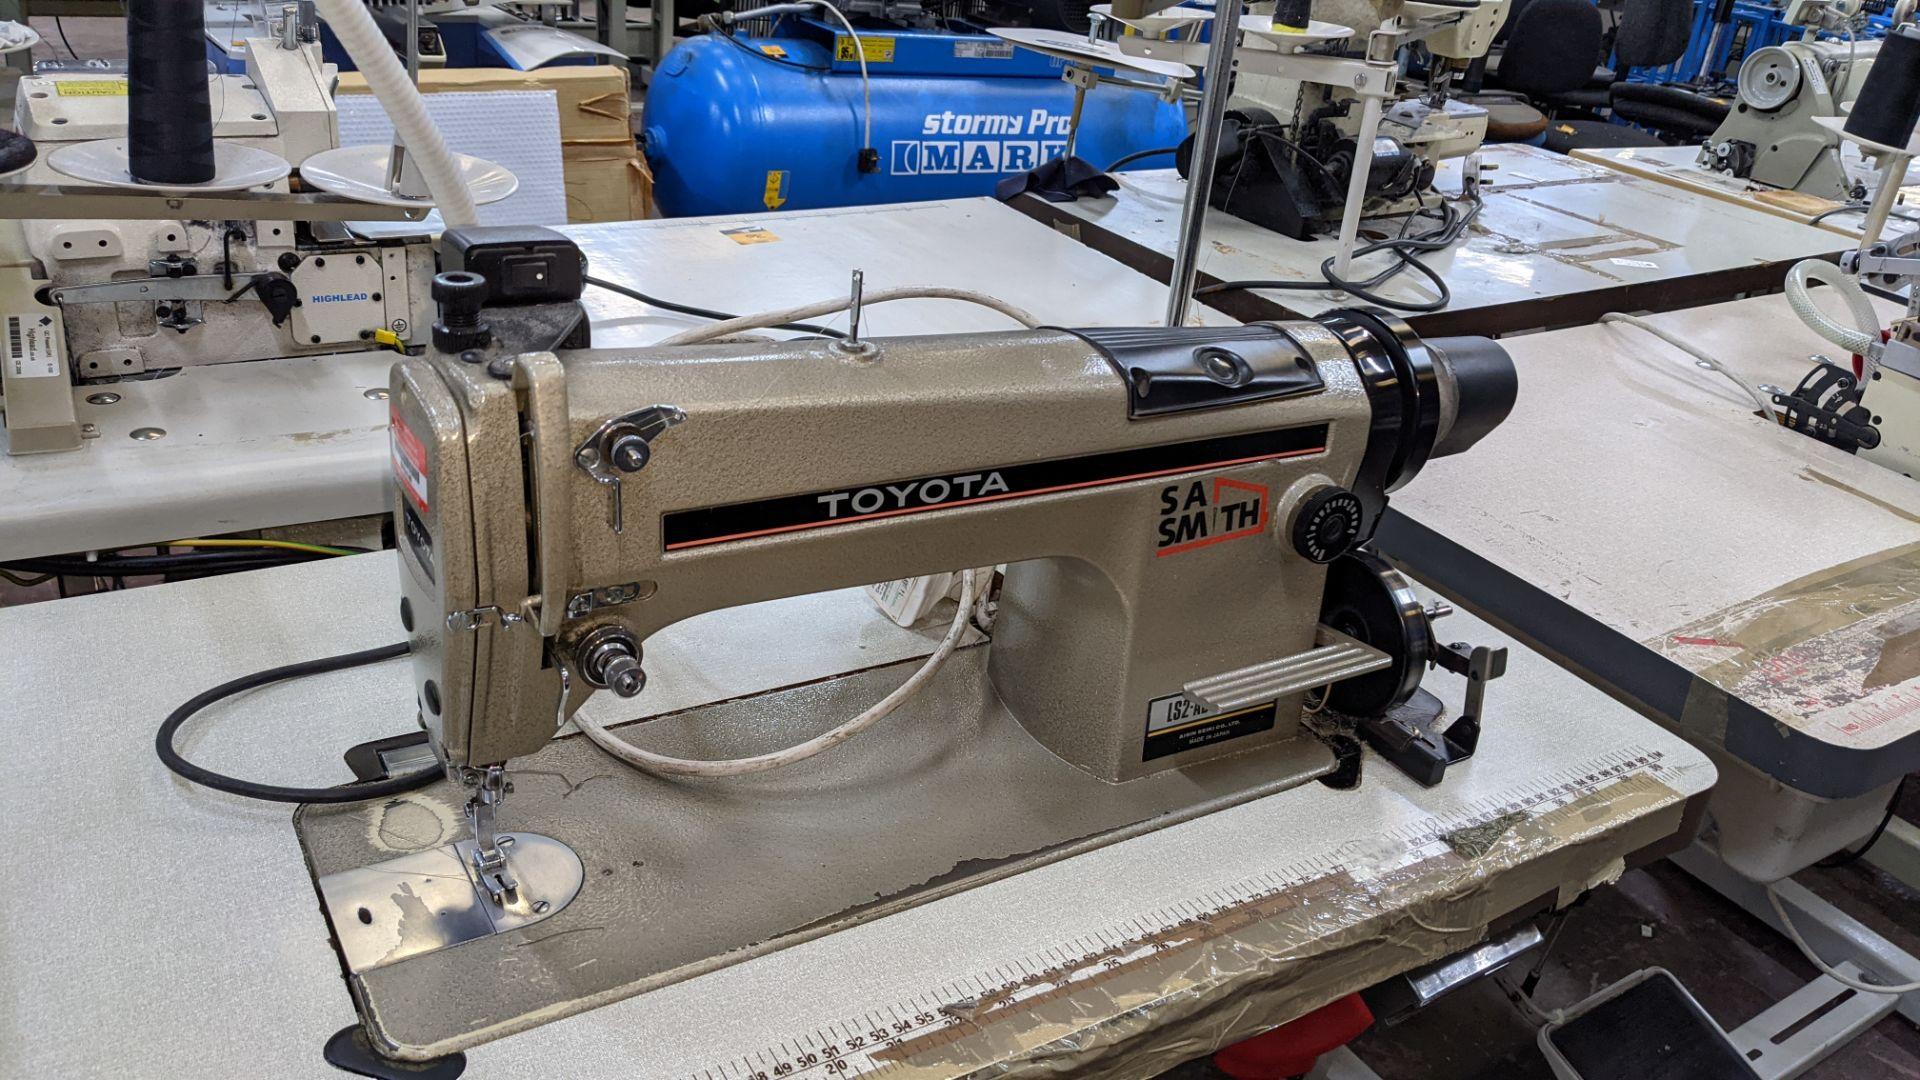 Toyota sewing machine - Image 8 of 17